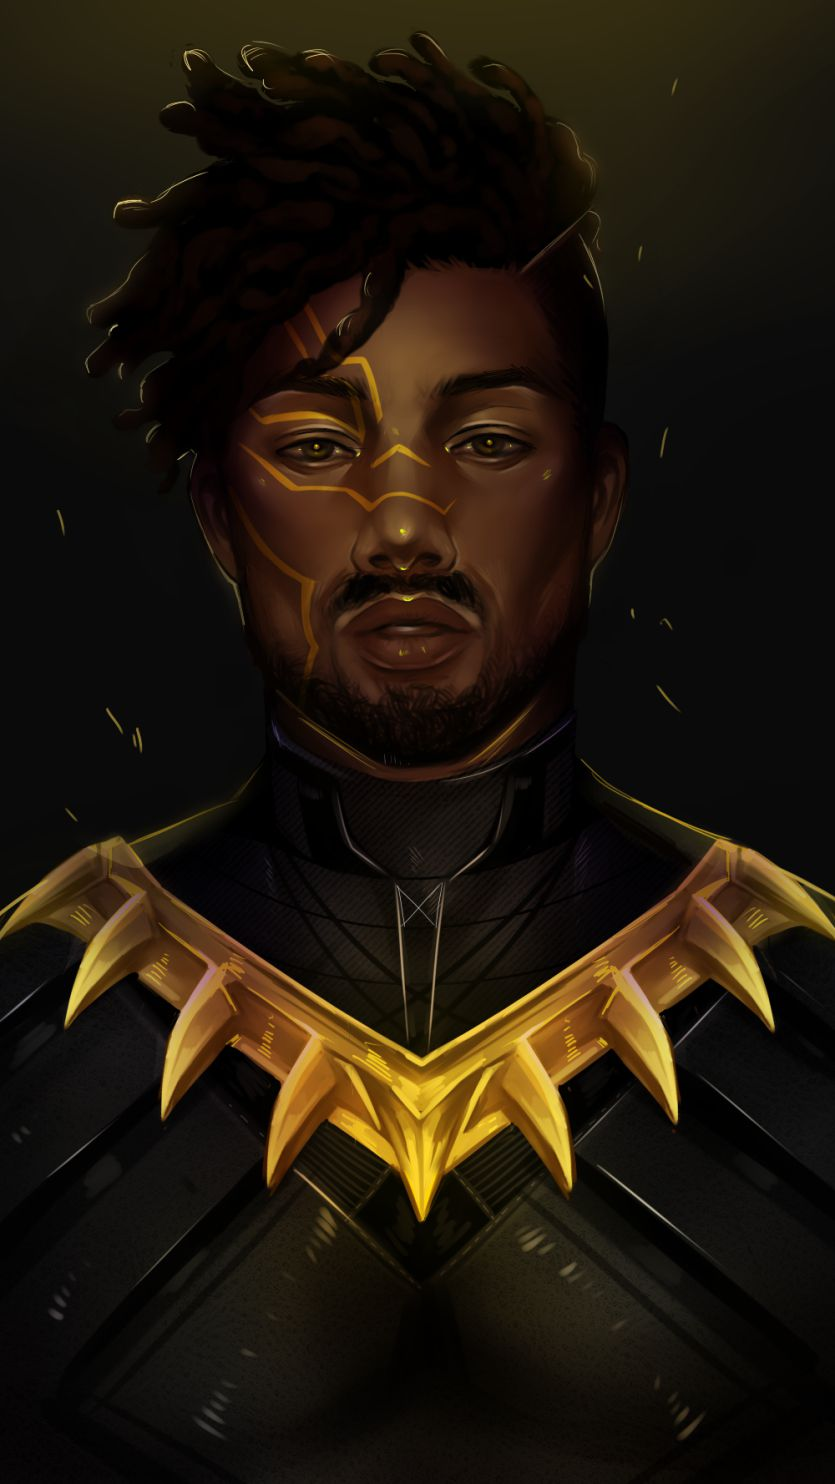 Black Panther Killmonger iPhone Wallpaper